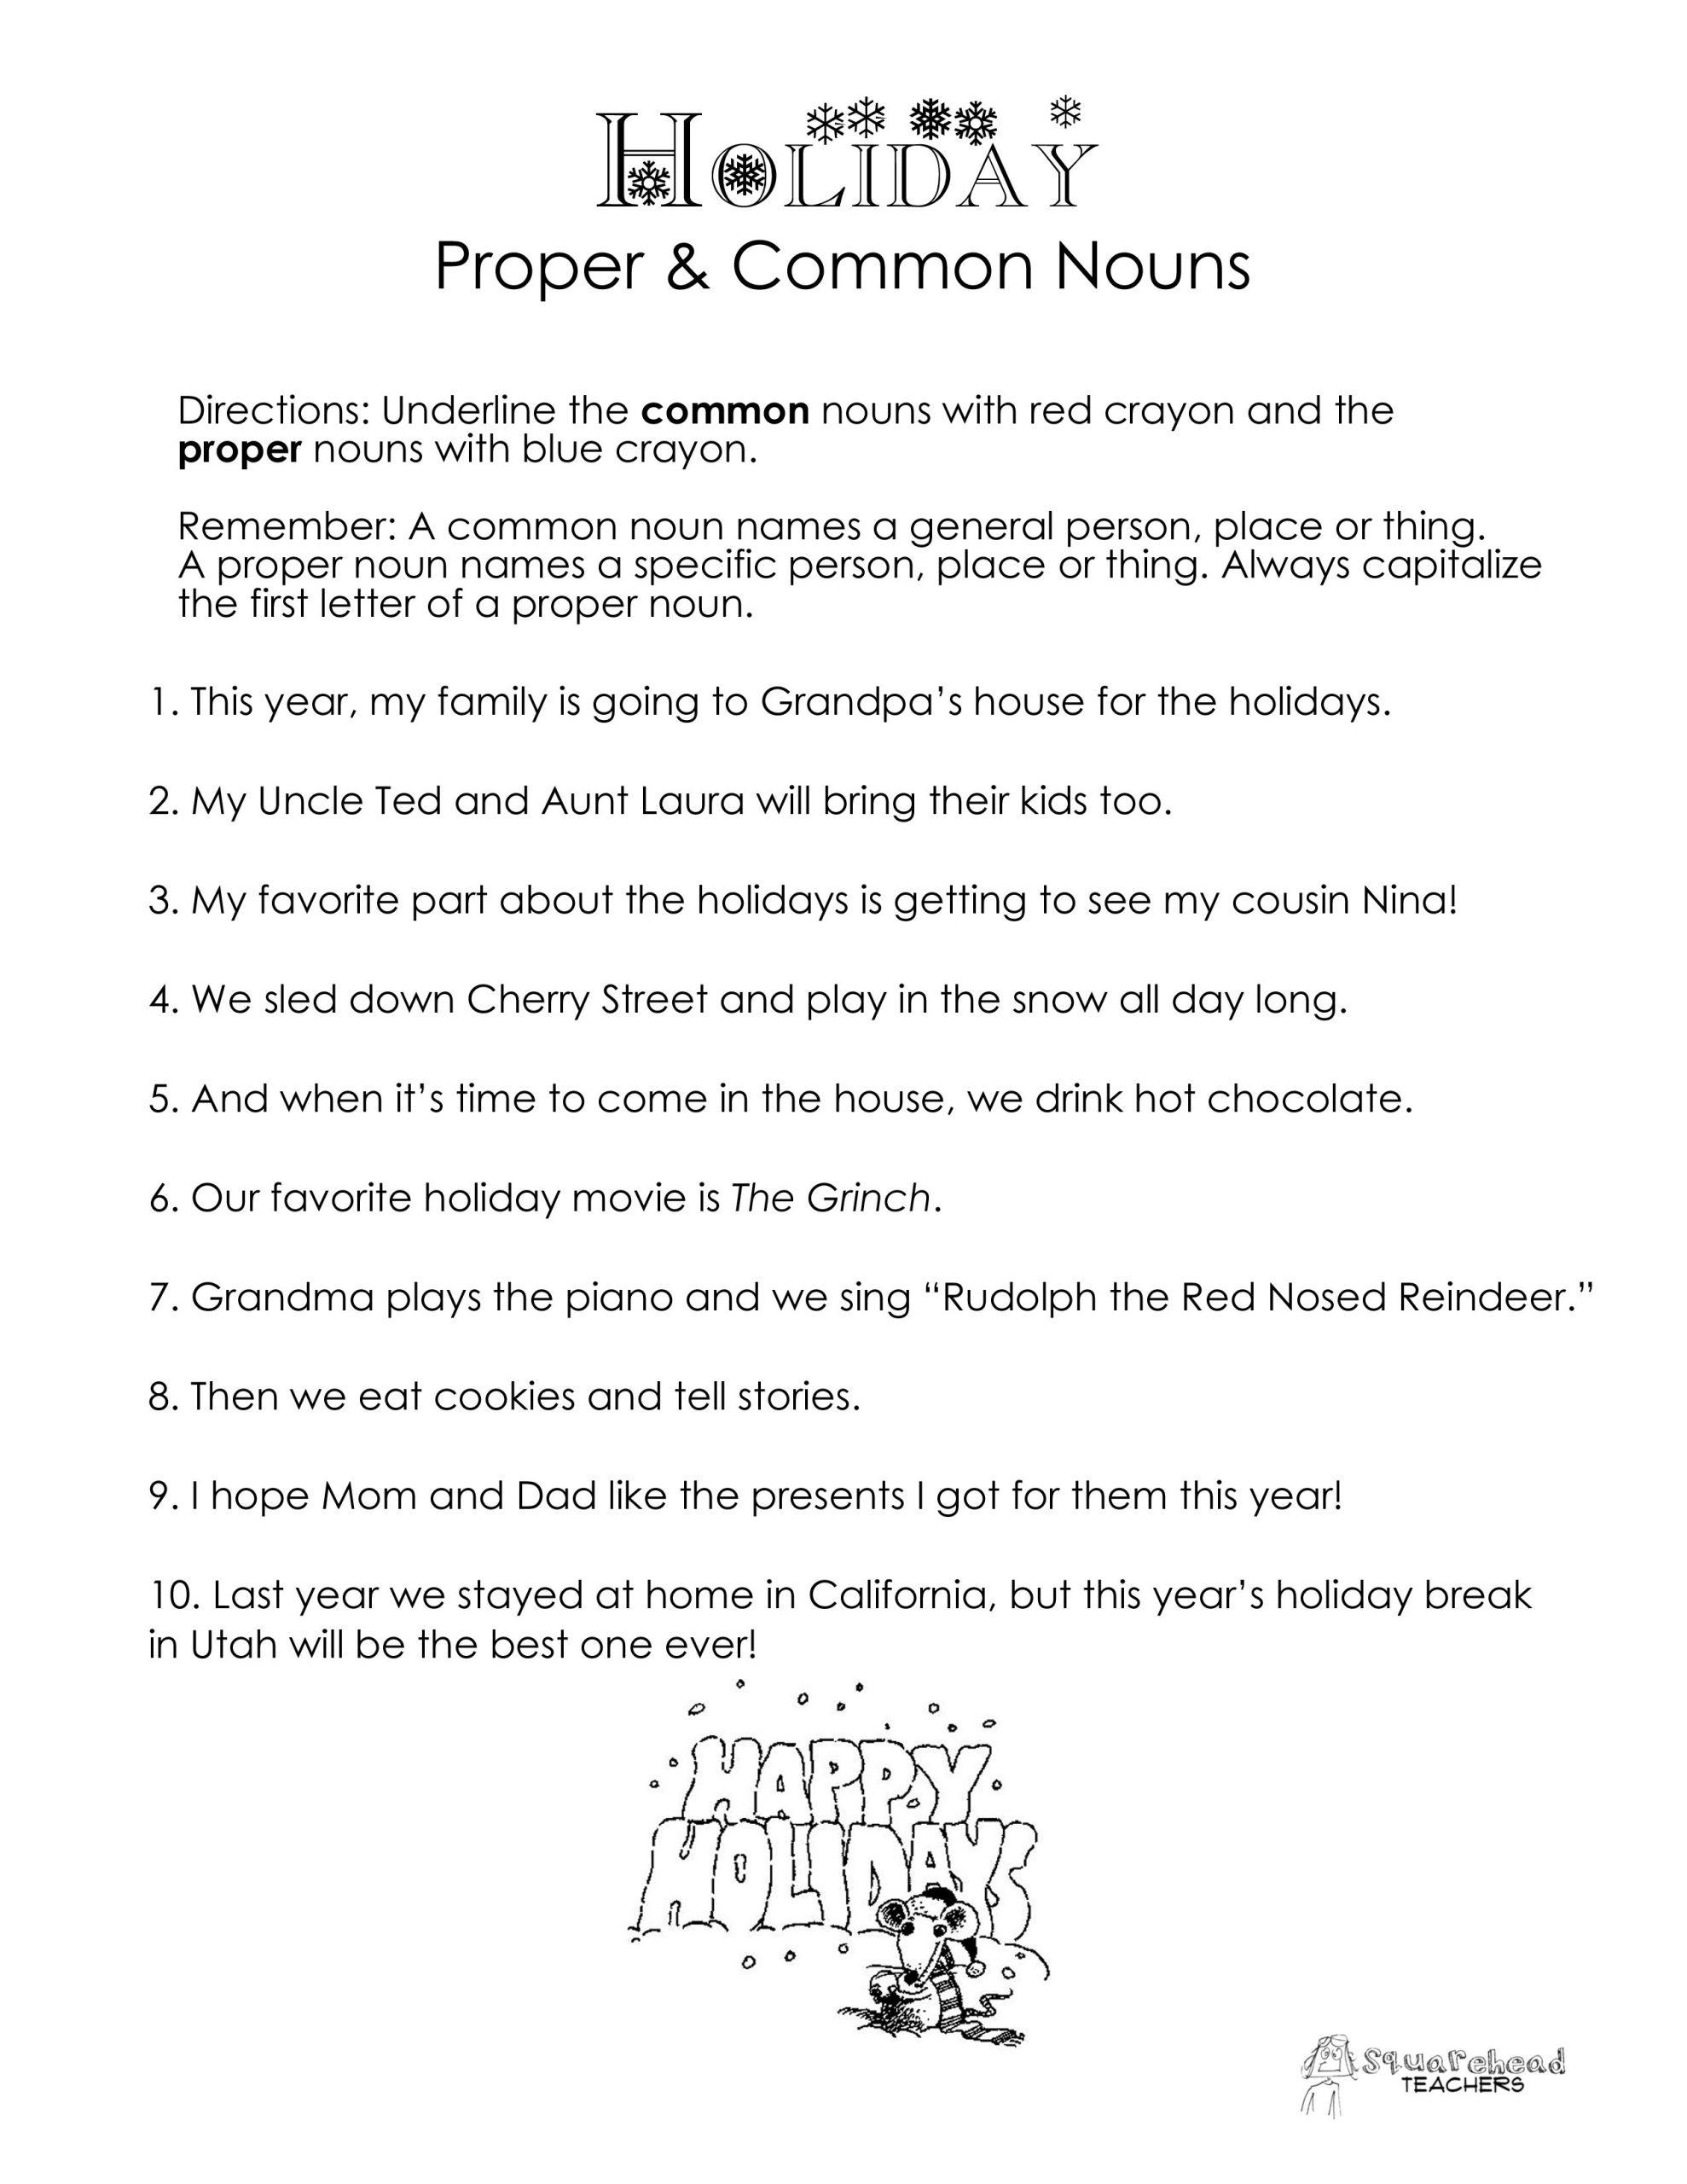 Proper Nouns Worksheet 2nd Grade Mon Vs Proper Nouns Christmas Winter Holidays Worksheet